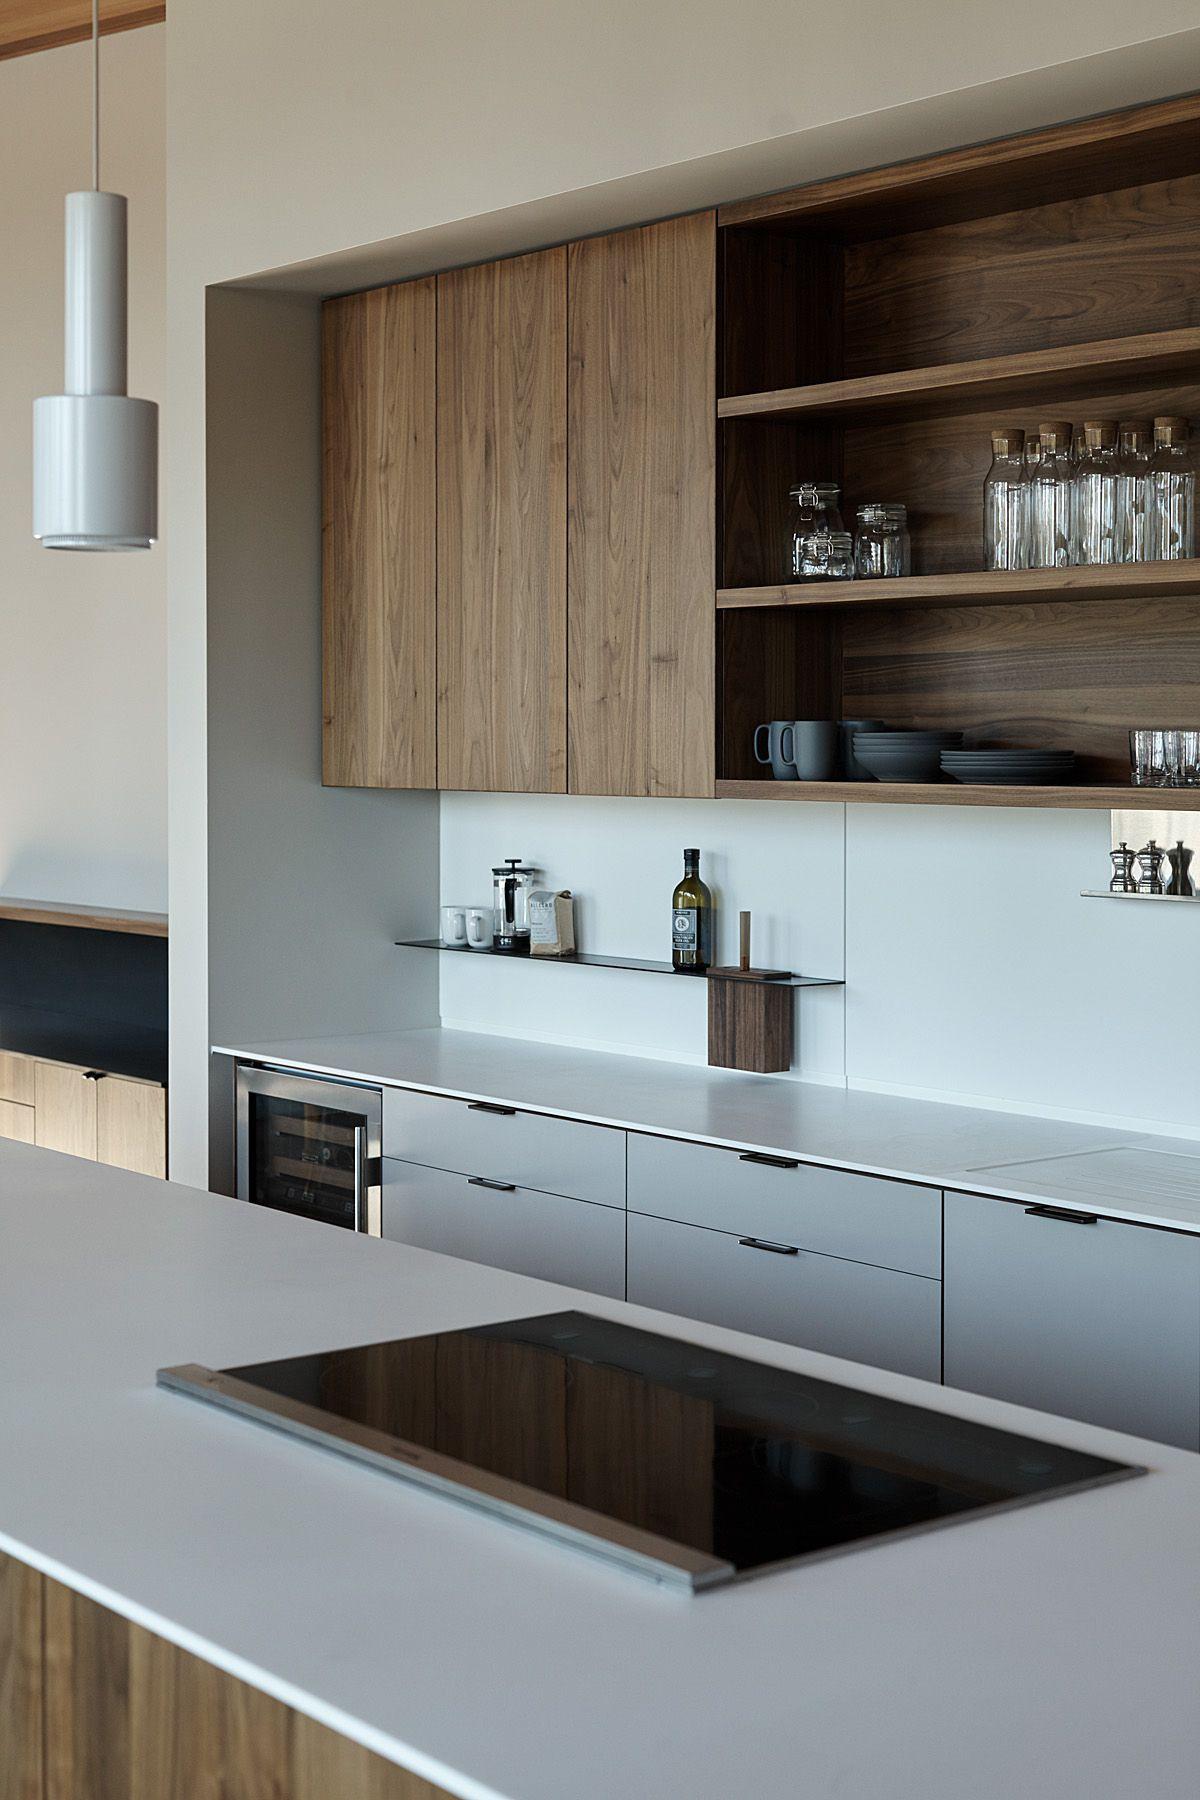 Decoration Cuisine Moderne Blanche image décoration cuisine moderne de sabouille du tableau